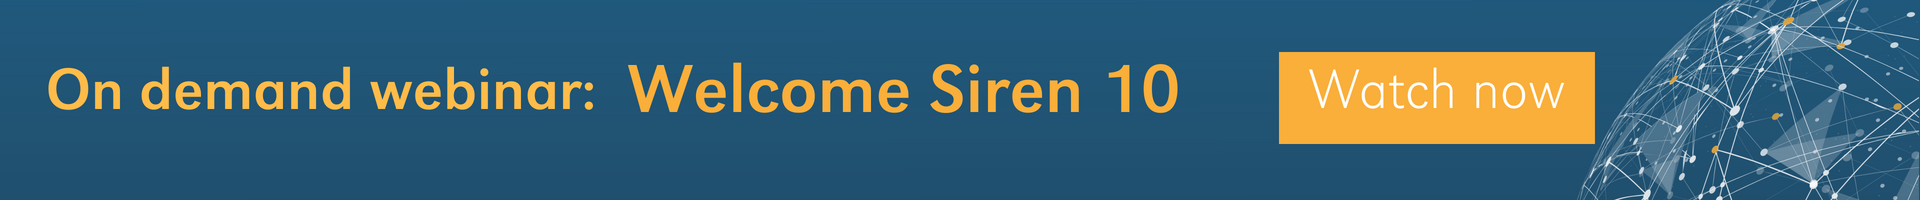 On demand webinar - Welcome Siren 10: Big data joins